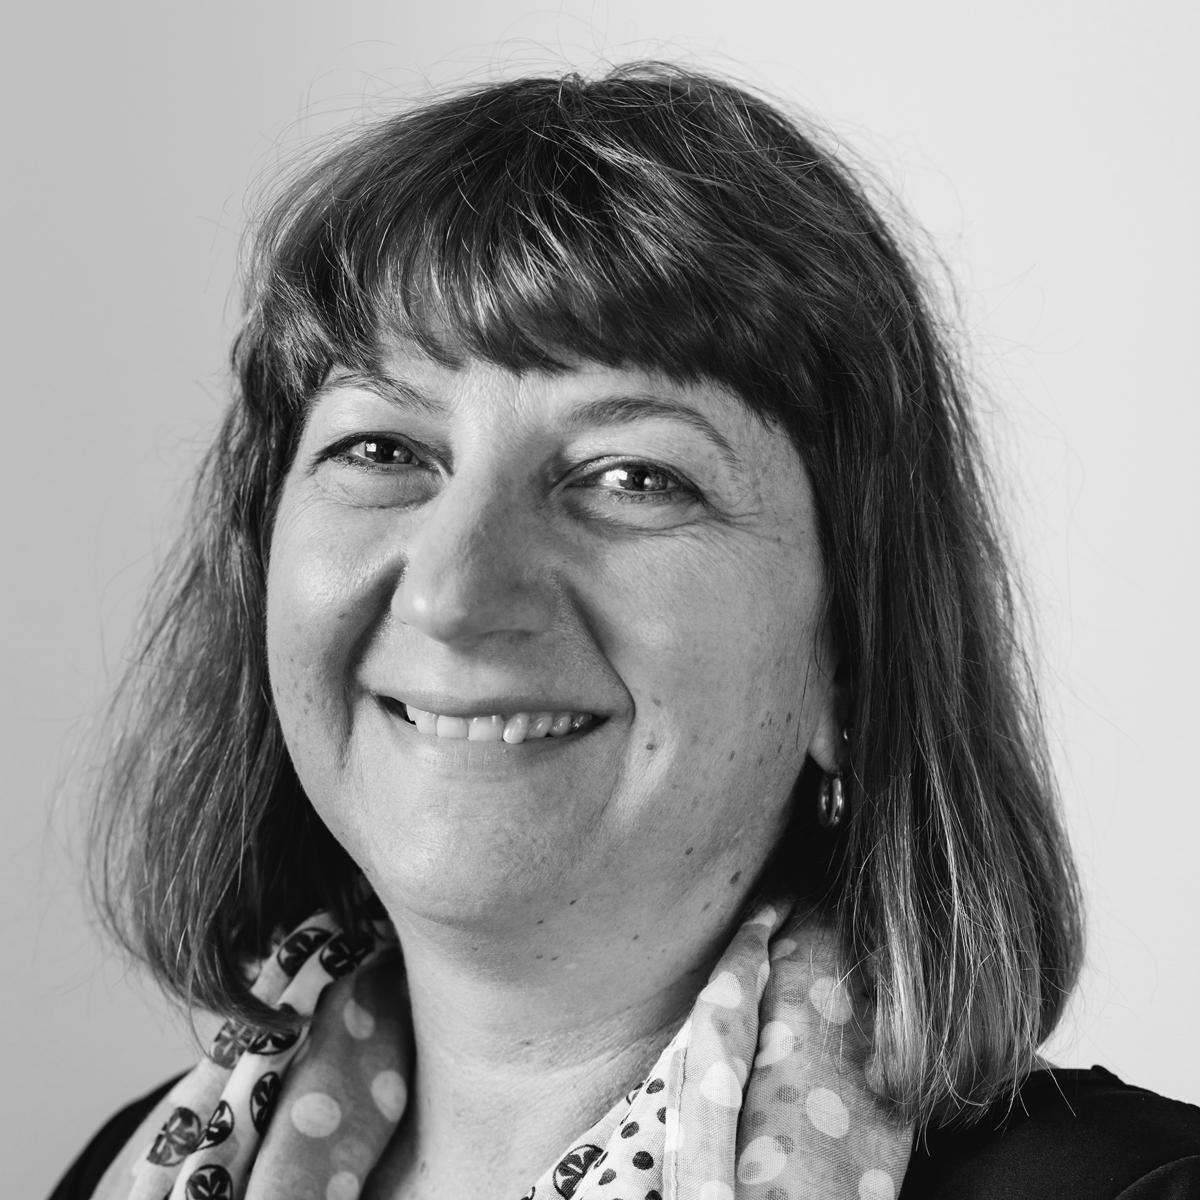 Maria Cenic